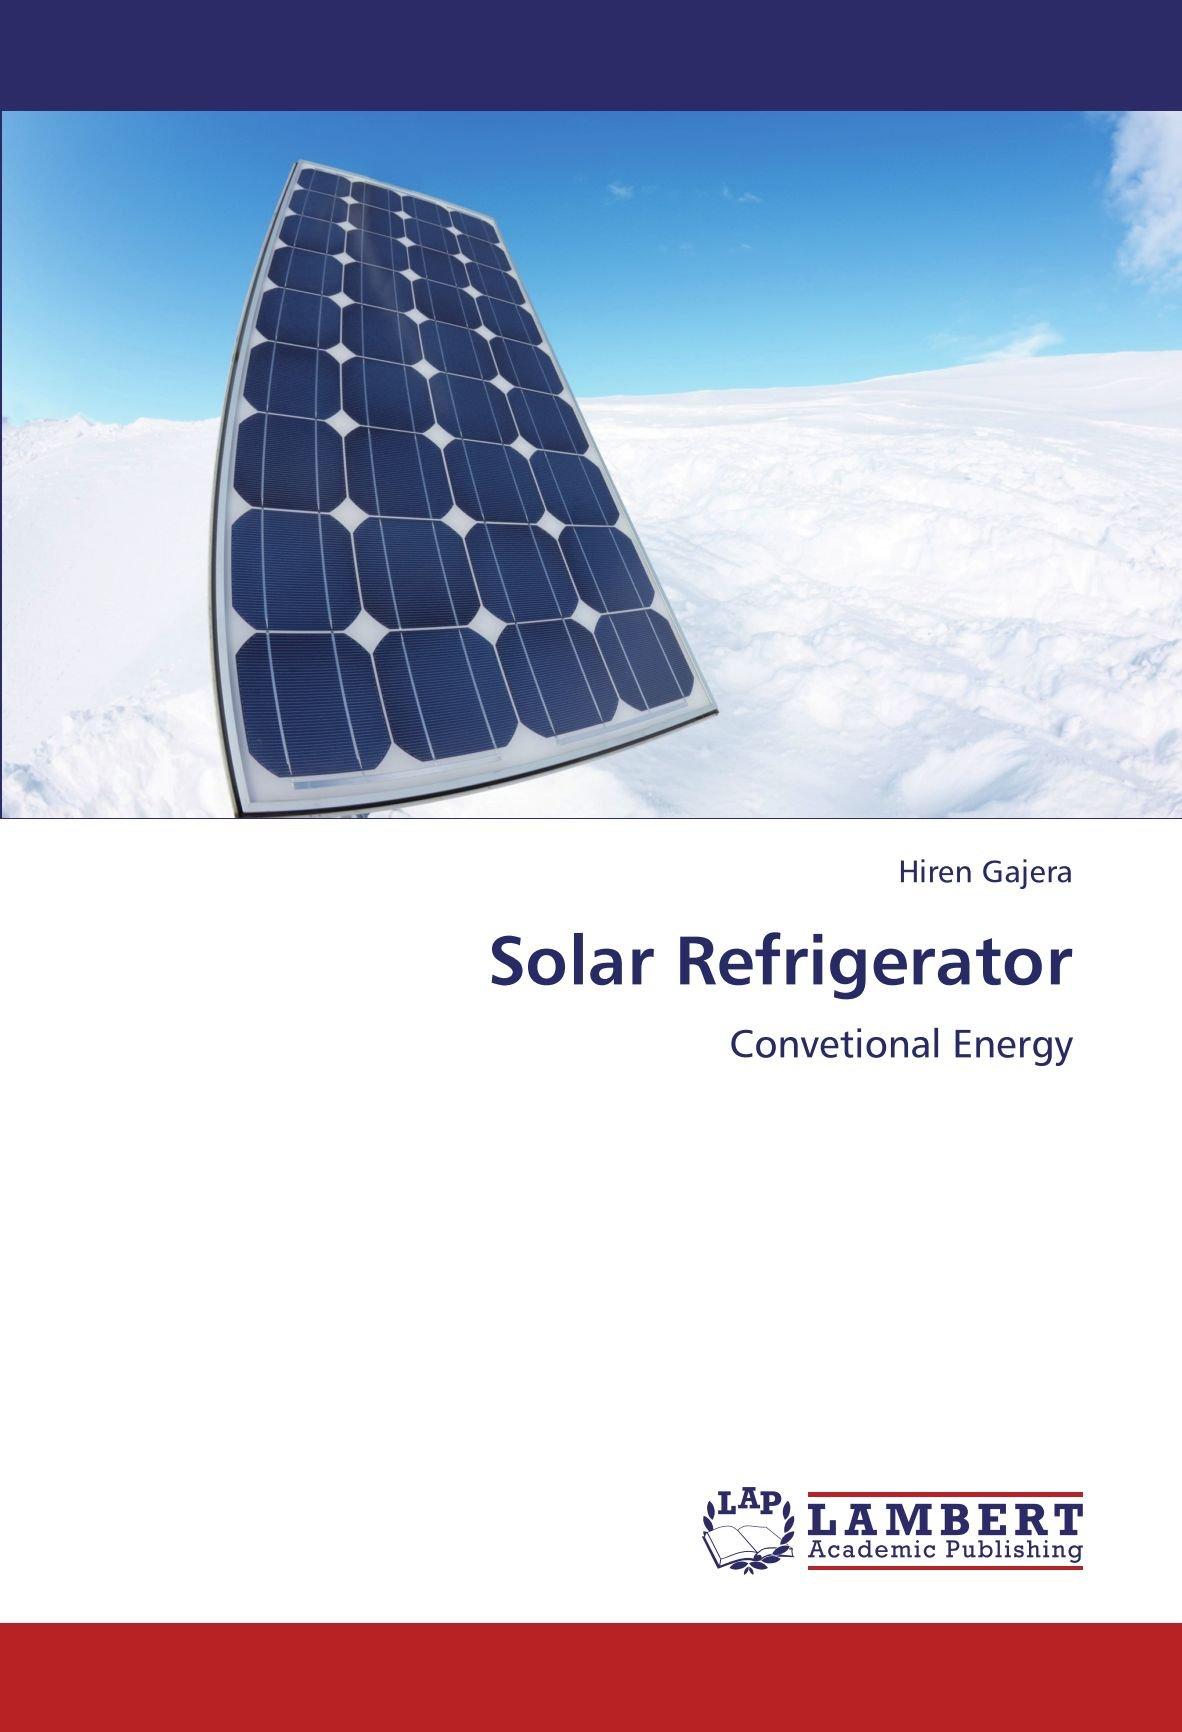 Solar Refrigerator: Convetional Energy: Hiren Gajera